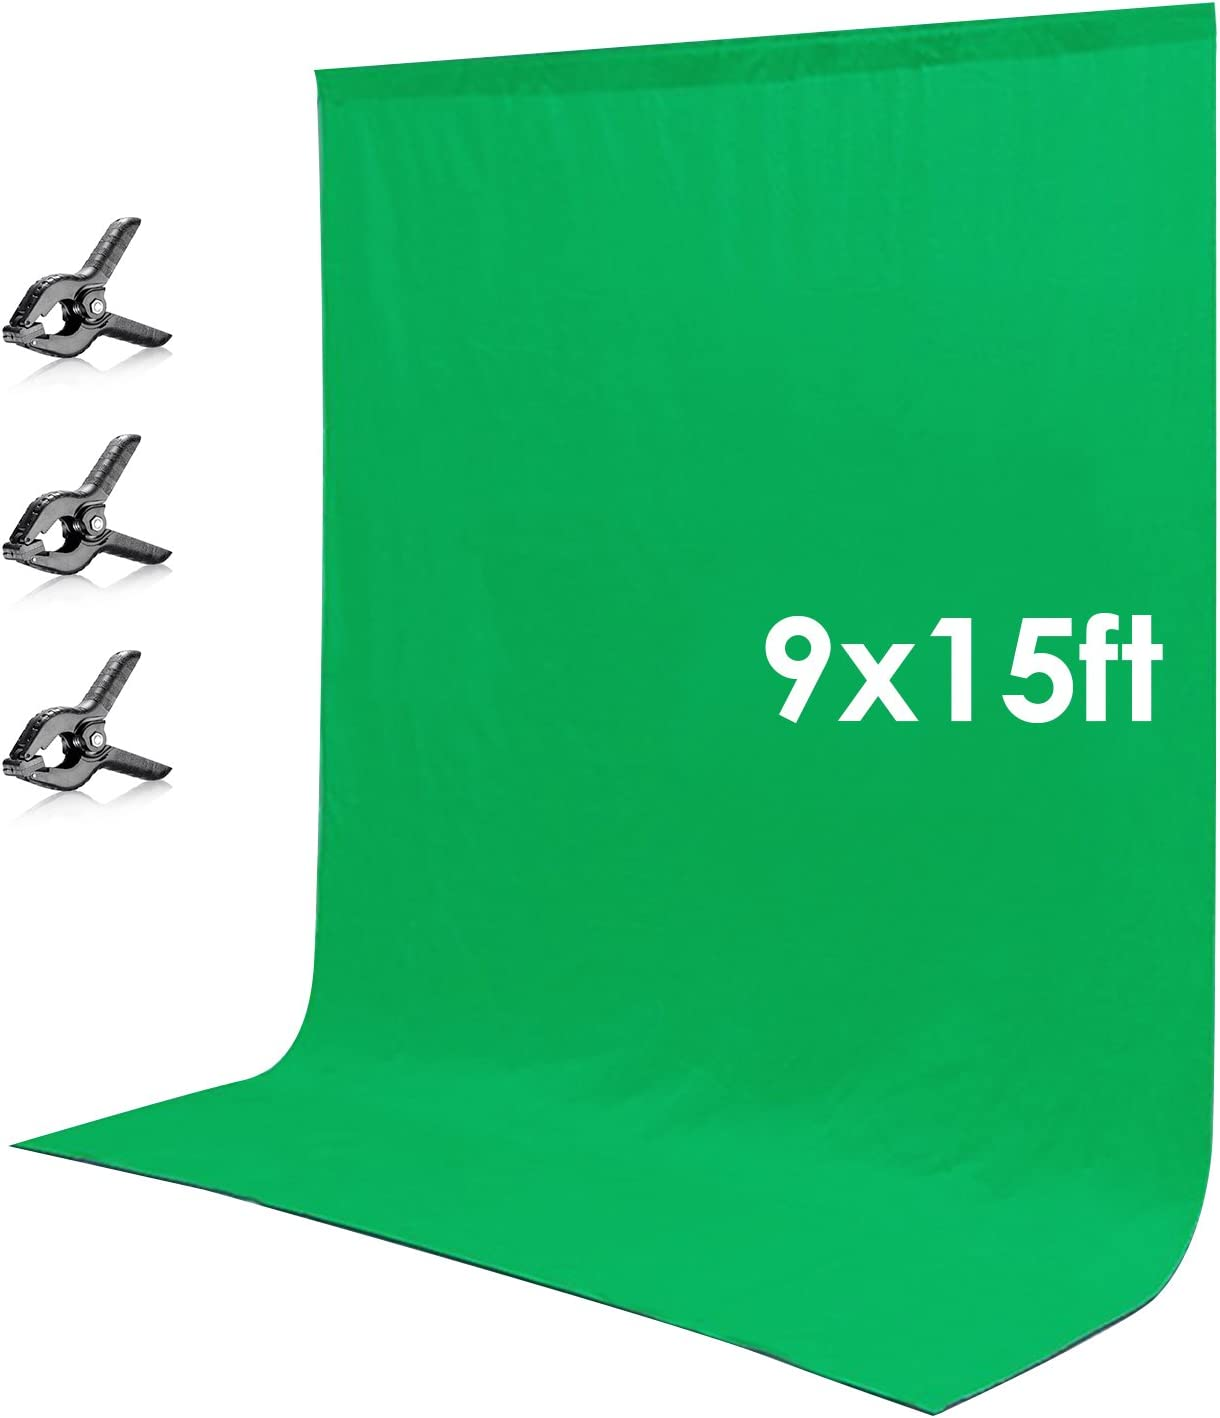 Neewer 2.7x4.6 Metros Pantalla de Fondo Chromakey Musel Verde Telón de Fondo con 3 Pinzas para Fotografía de Foto Video Estudio